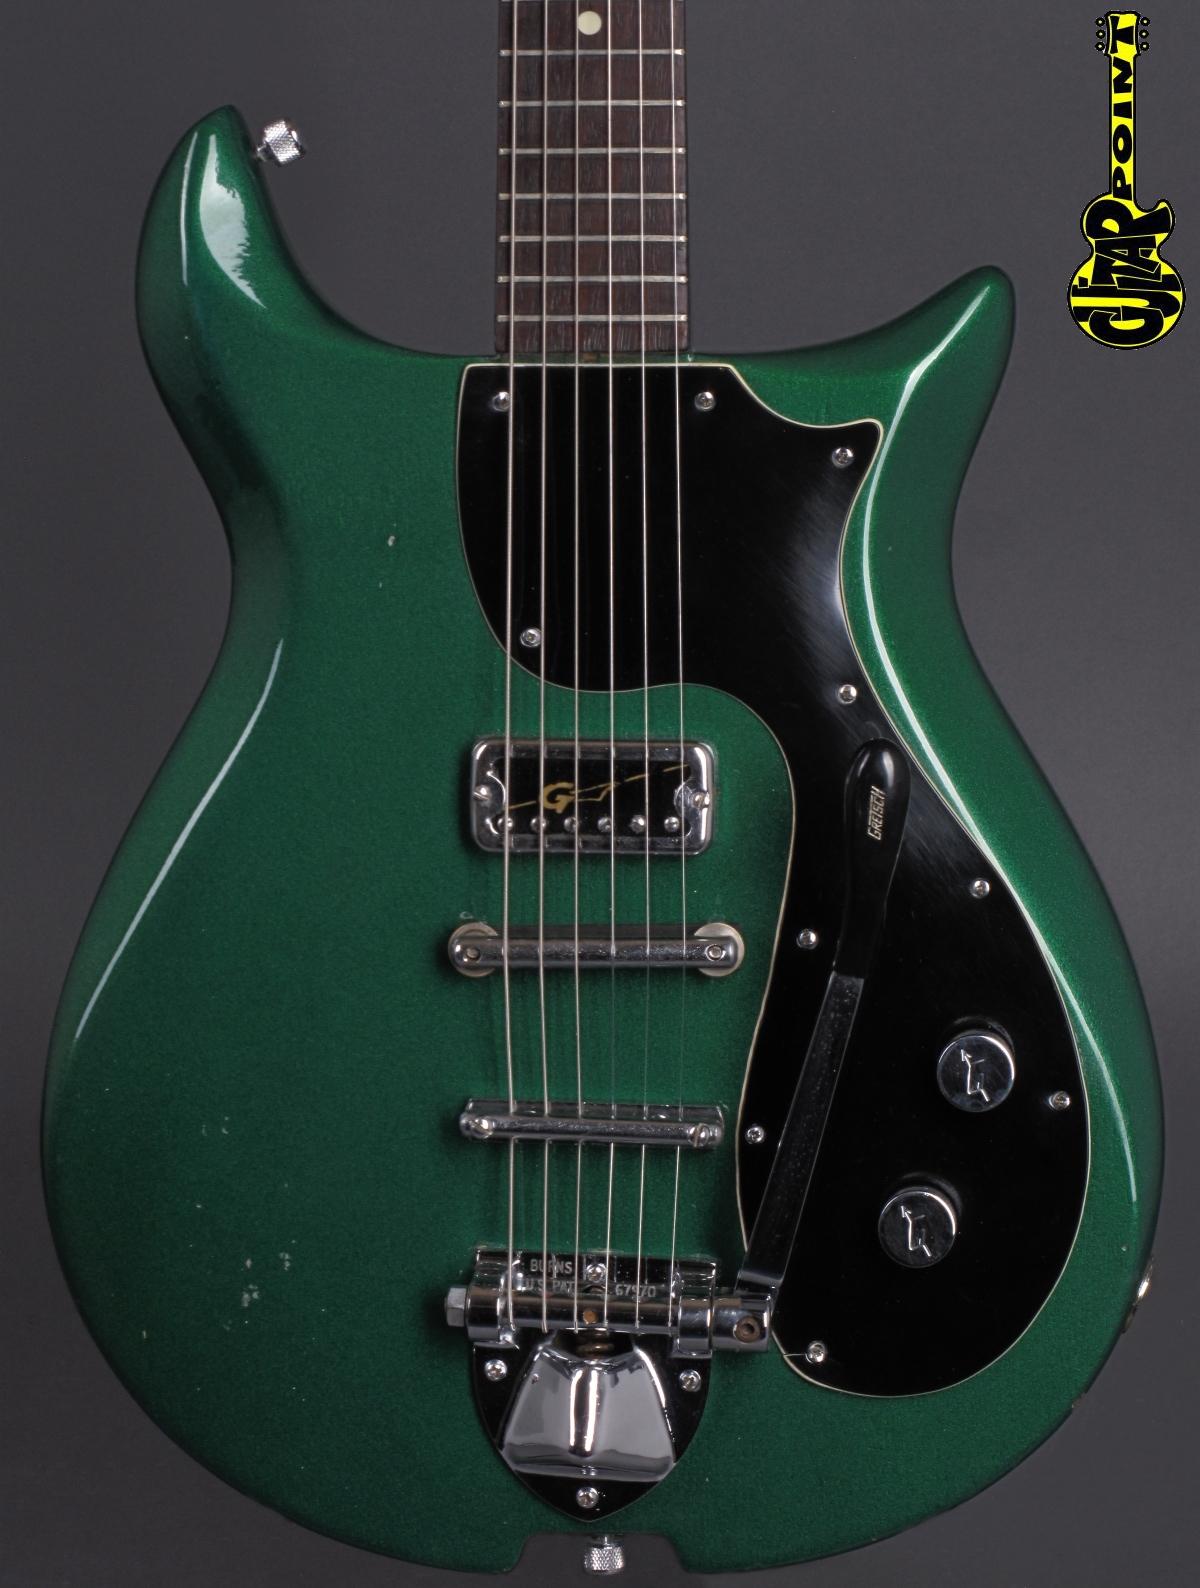 1966 Gretsch 6134 Corvette - Cadillac Green   ...rare !!!